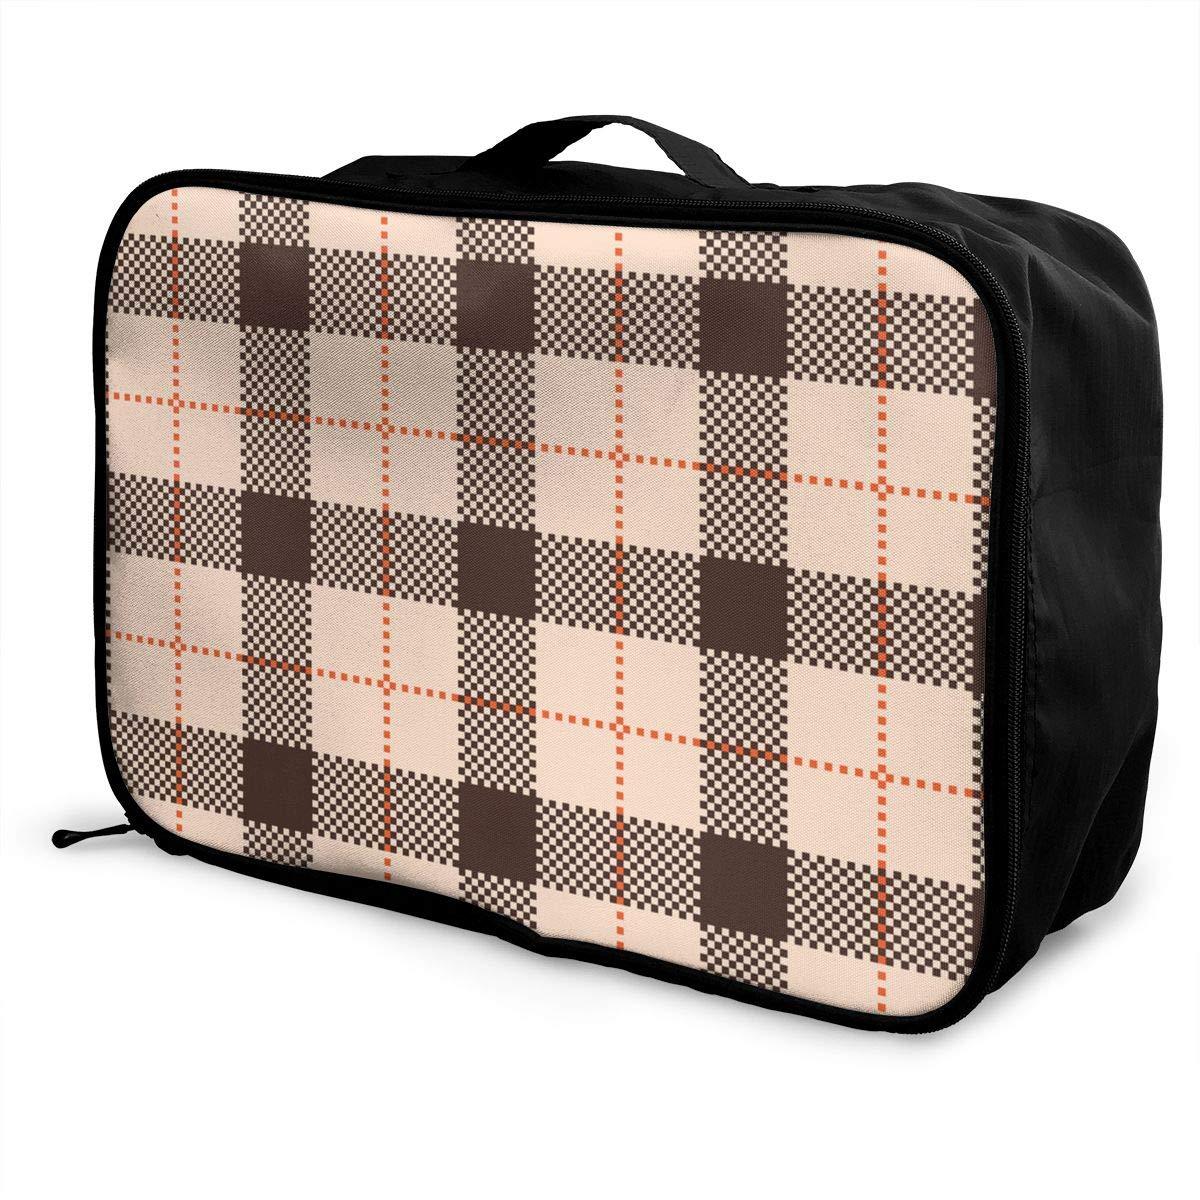 ADGAI Classic Tartan and Check Plaid Seamless Patterns Canvas Travel Weekender Bag,Fashion Custom Lightweight Large Capacity Portable Luggage Bag,Suitcase Trolley Bag